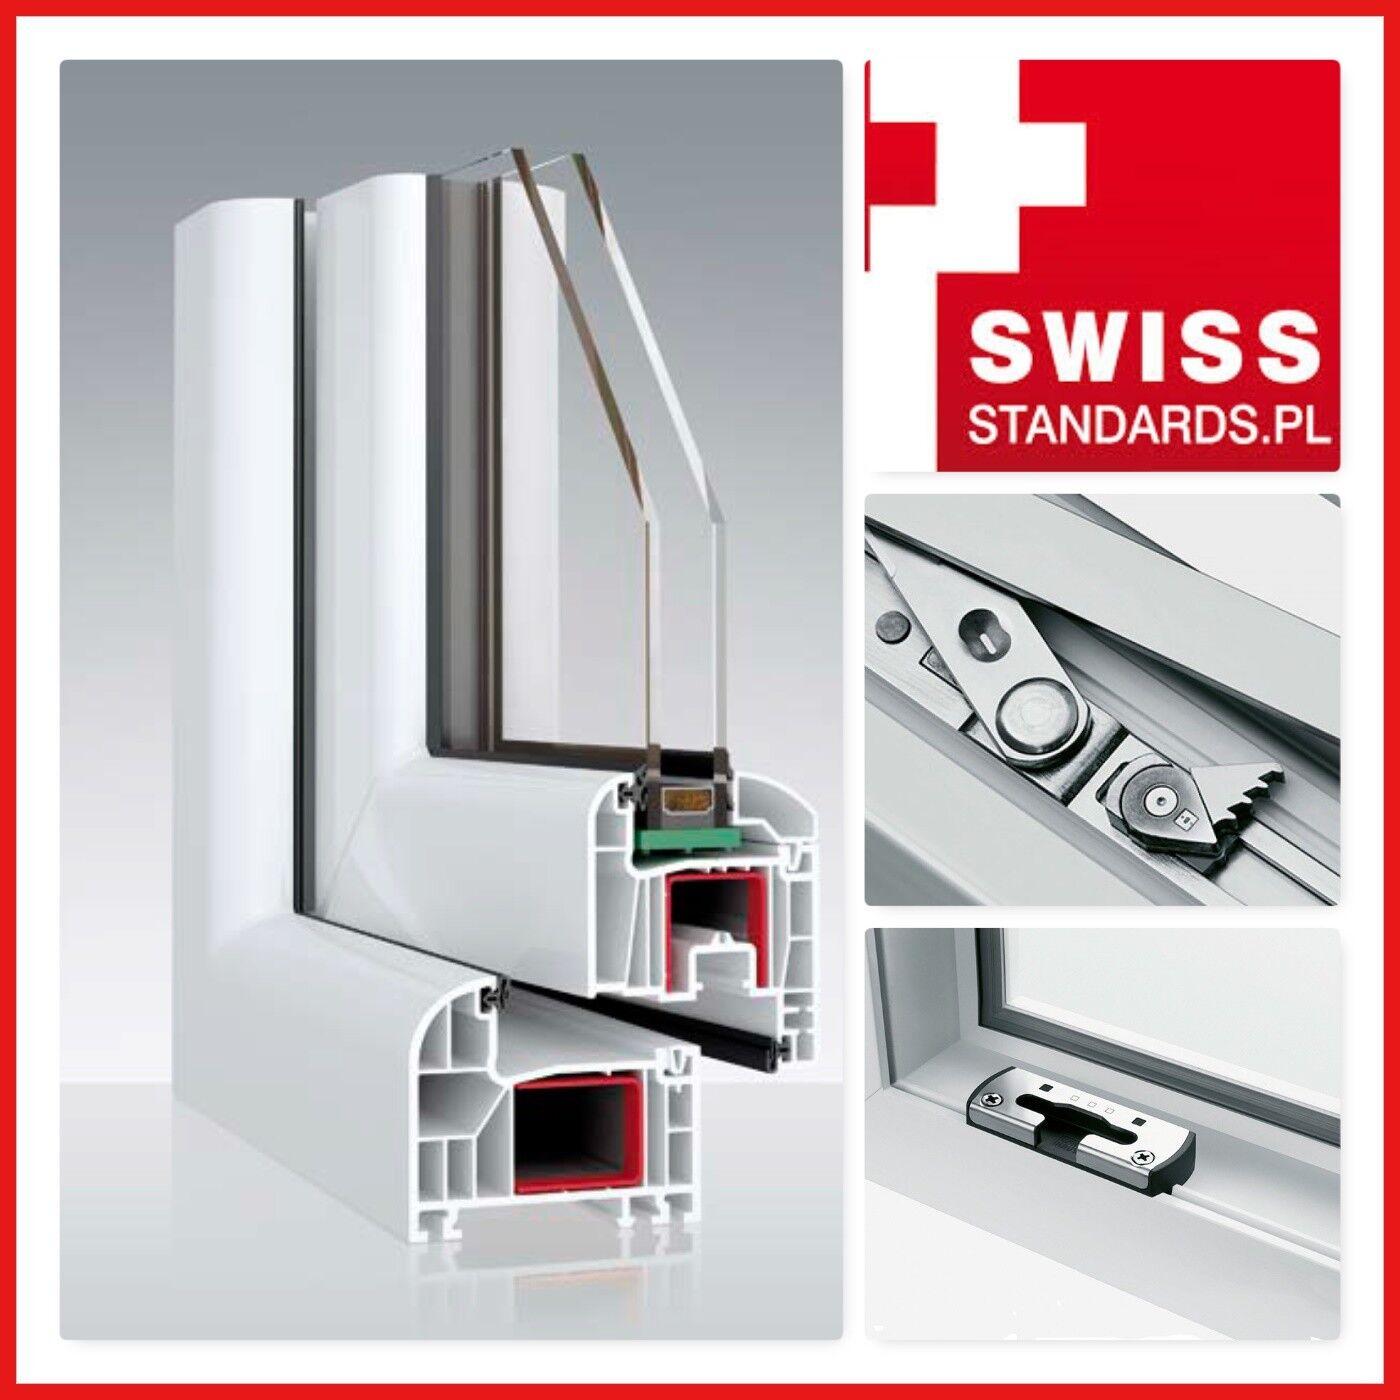 Fenster Ovlo Classic Dreh   Kipp 2 Flügel 2   3 Fach Verglasung mit Rollladen